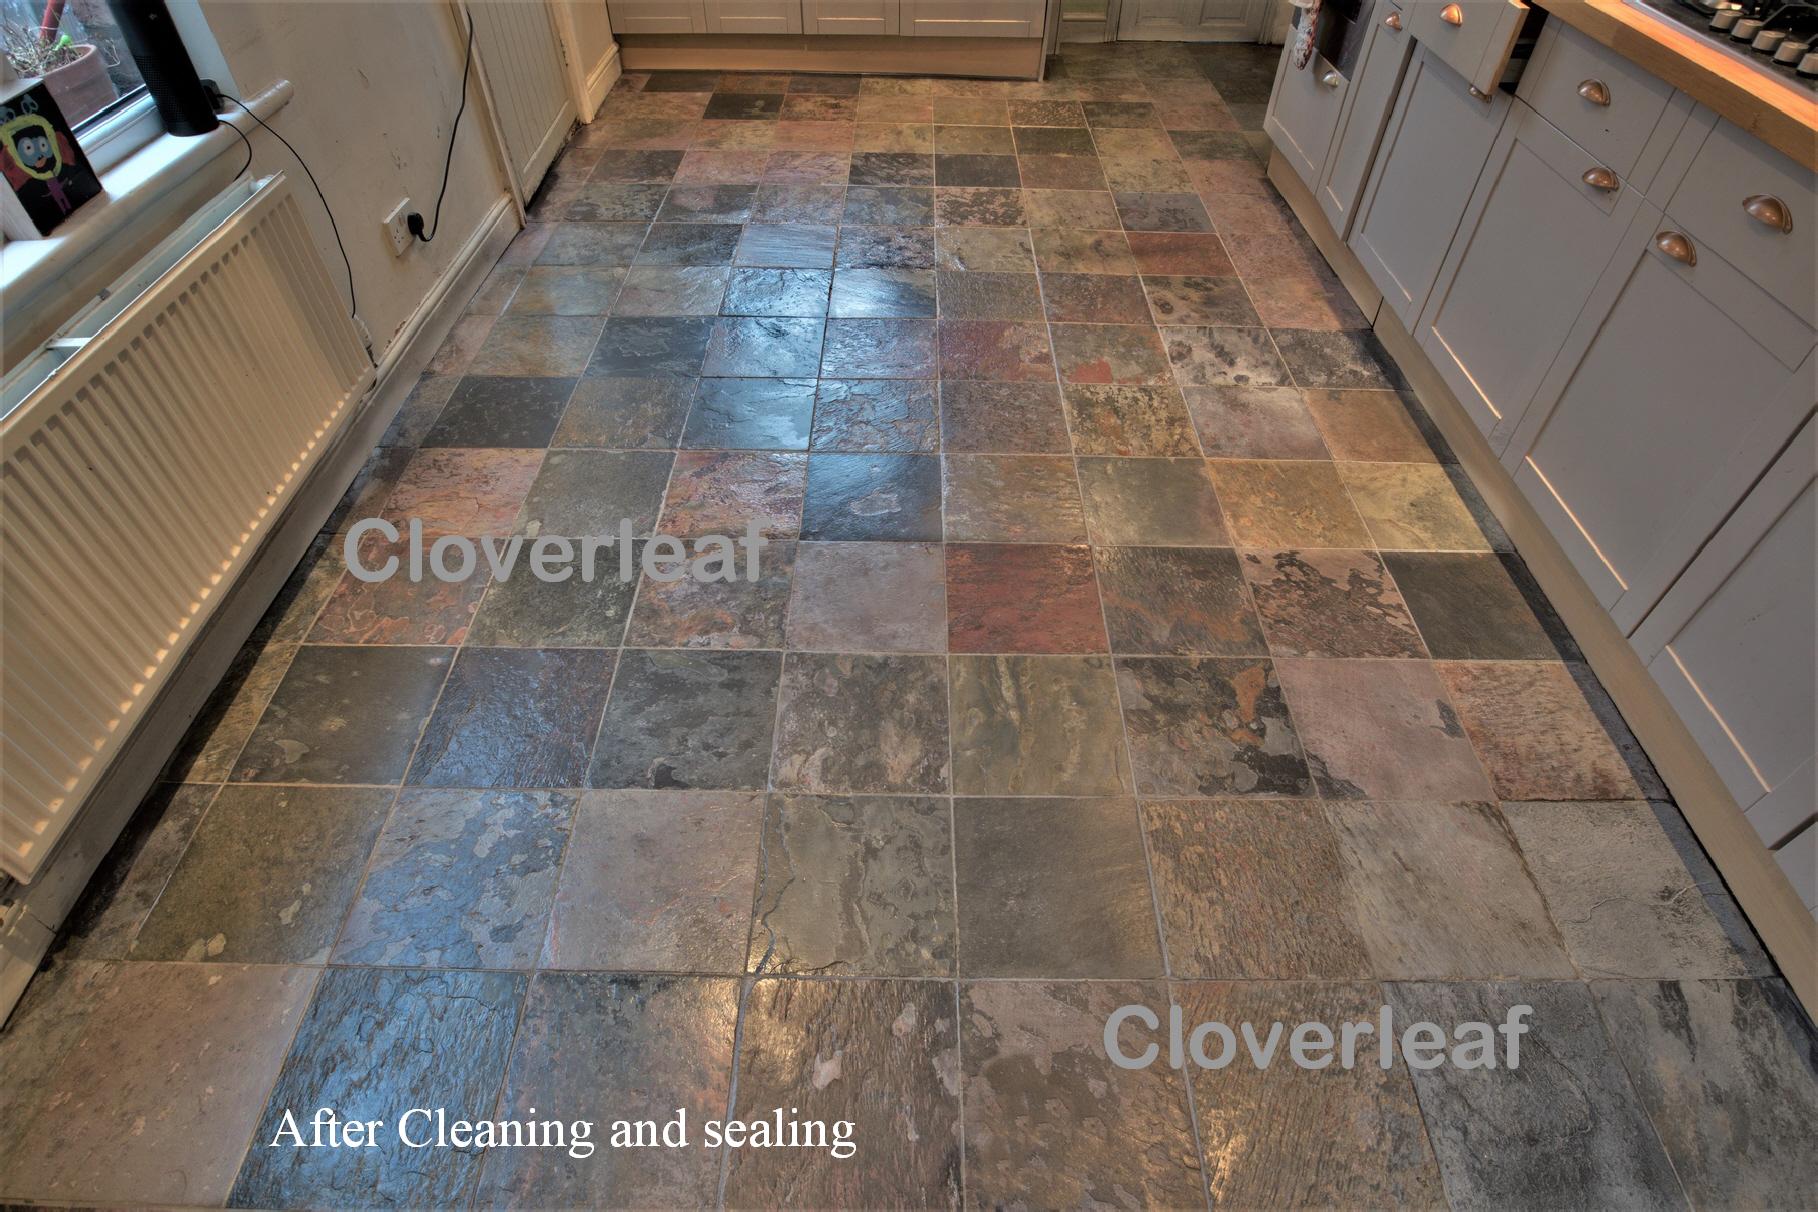 slate cleaning Macclesfield